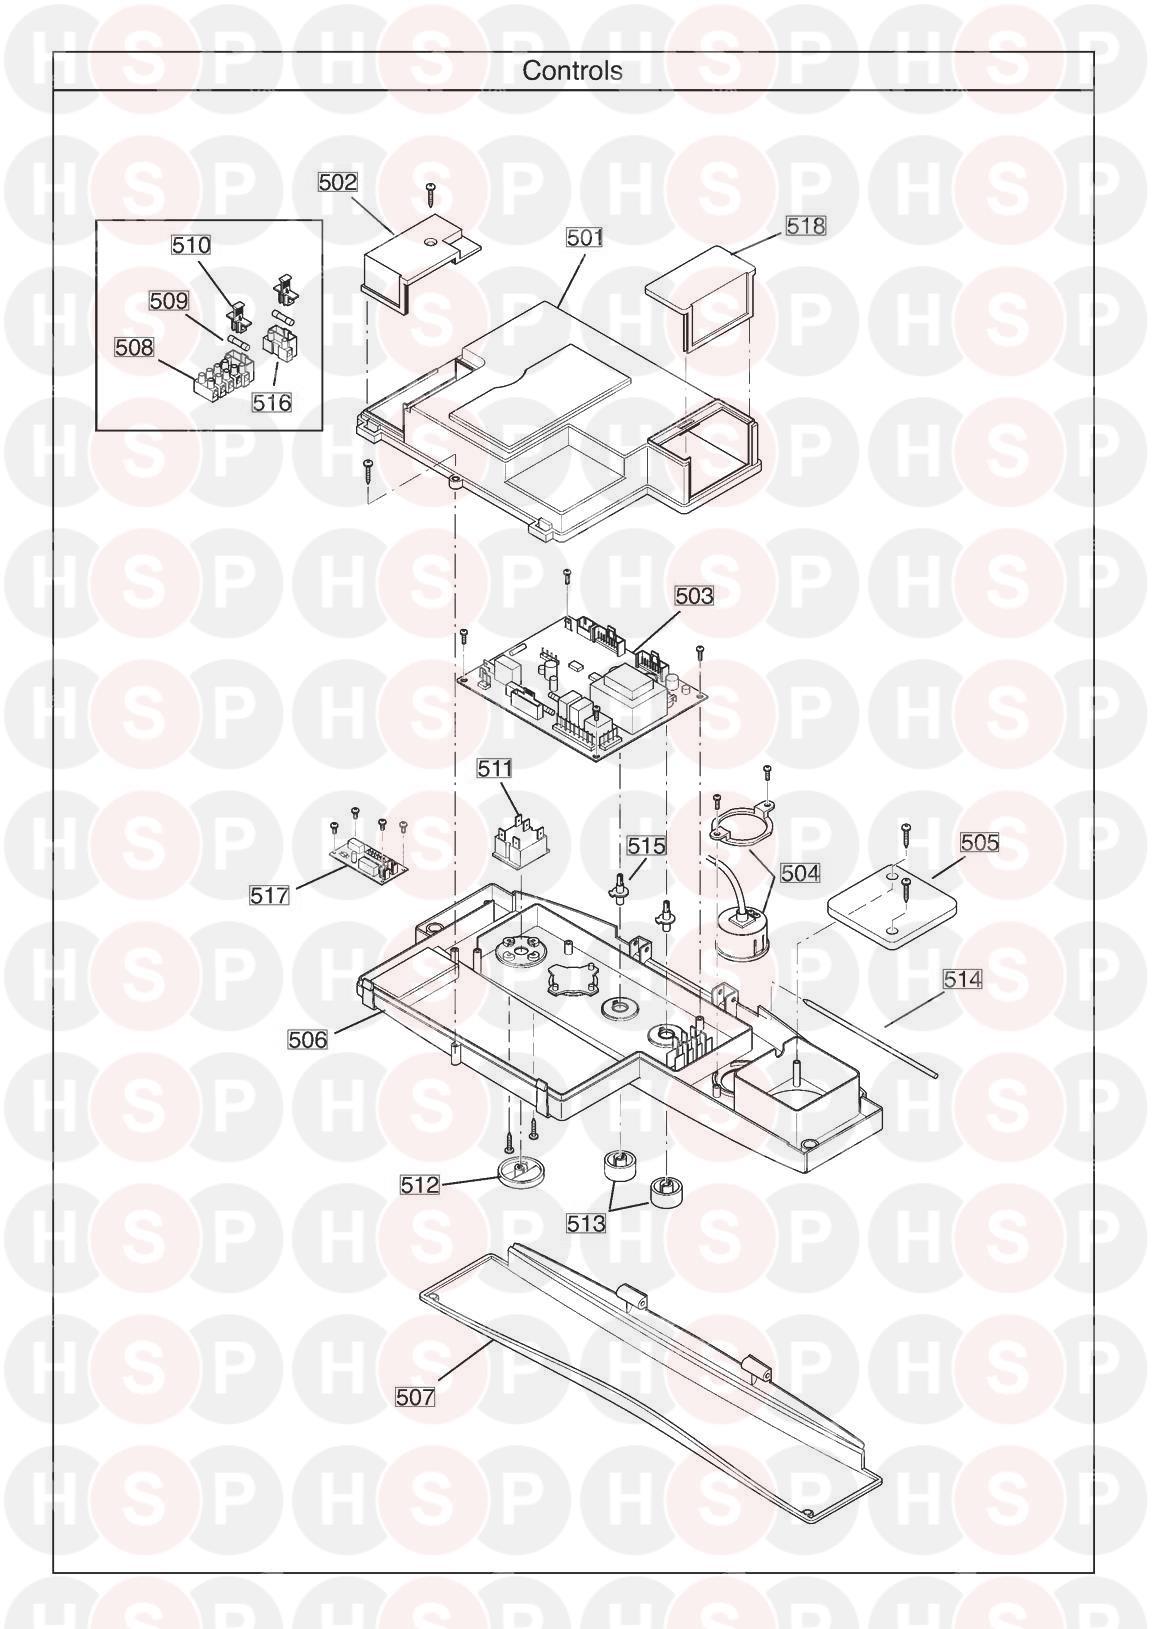 Potterton PROMAX SYSTEM 32 ERP Appliance Diagram (CONTROLS